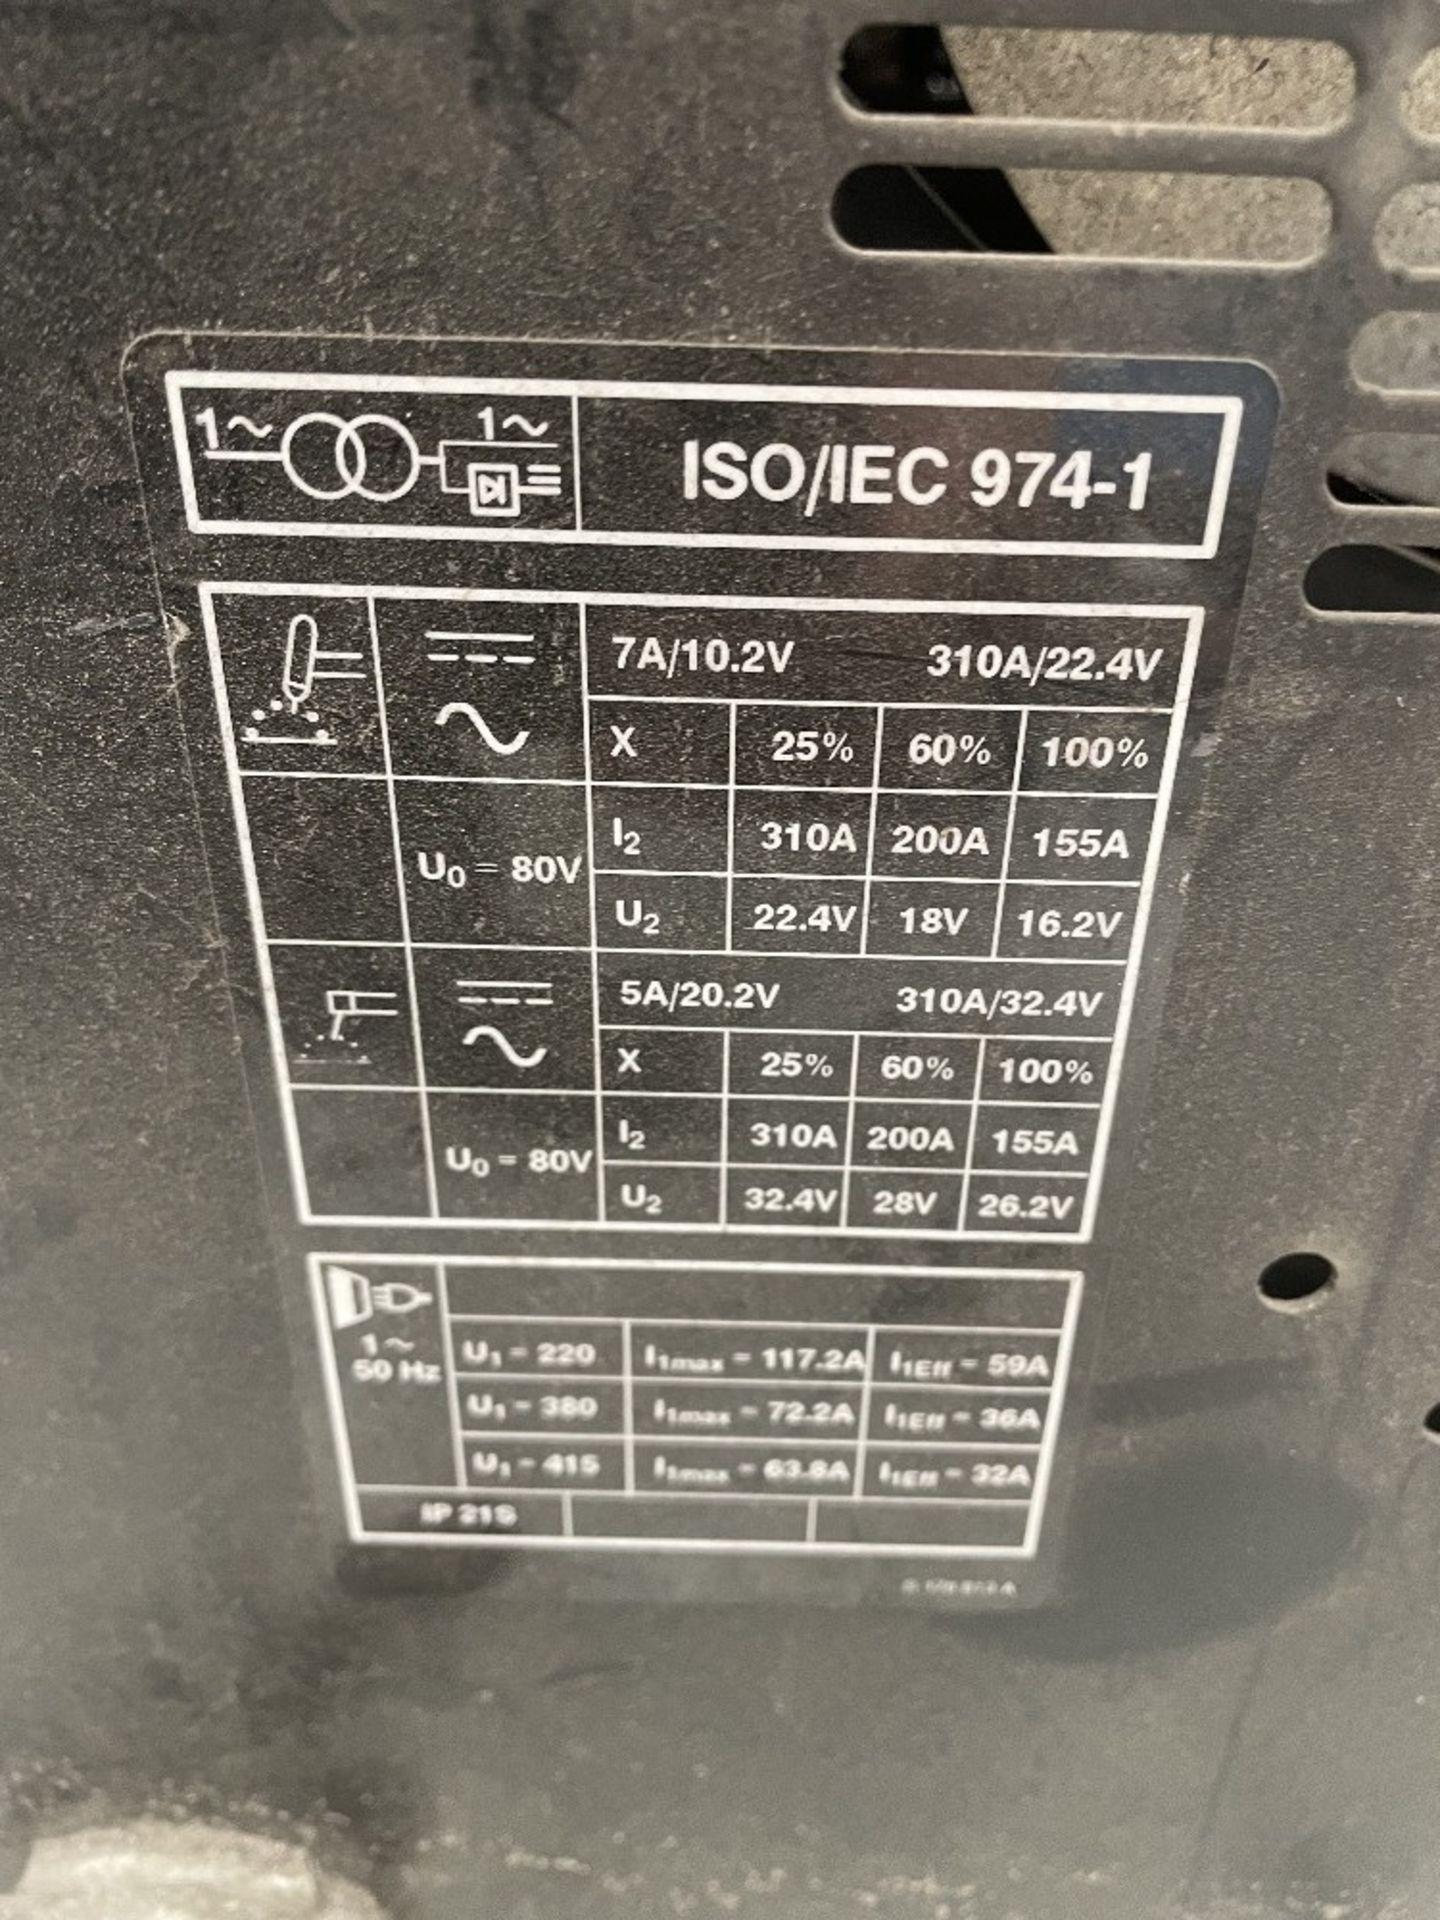 Miller Syncrowave 250 Tig Welder w/ TecArc XC1000 Water Cooler - Image 6 of 6